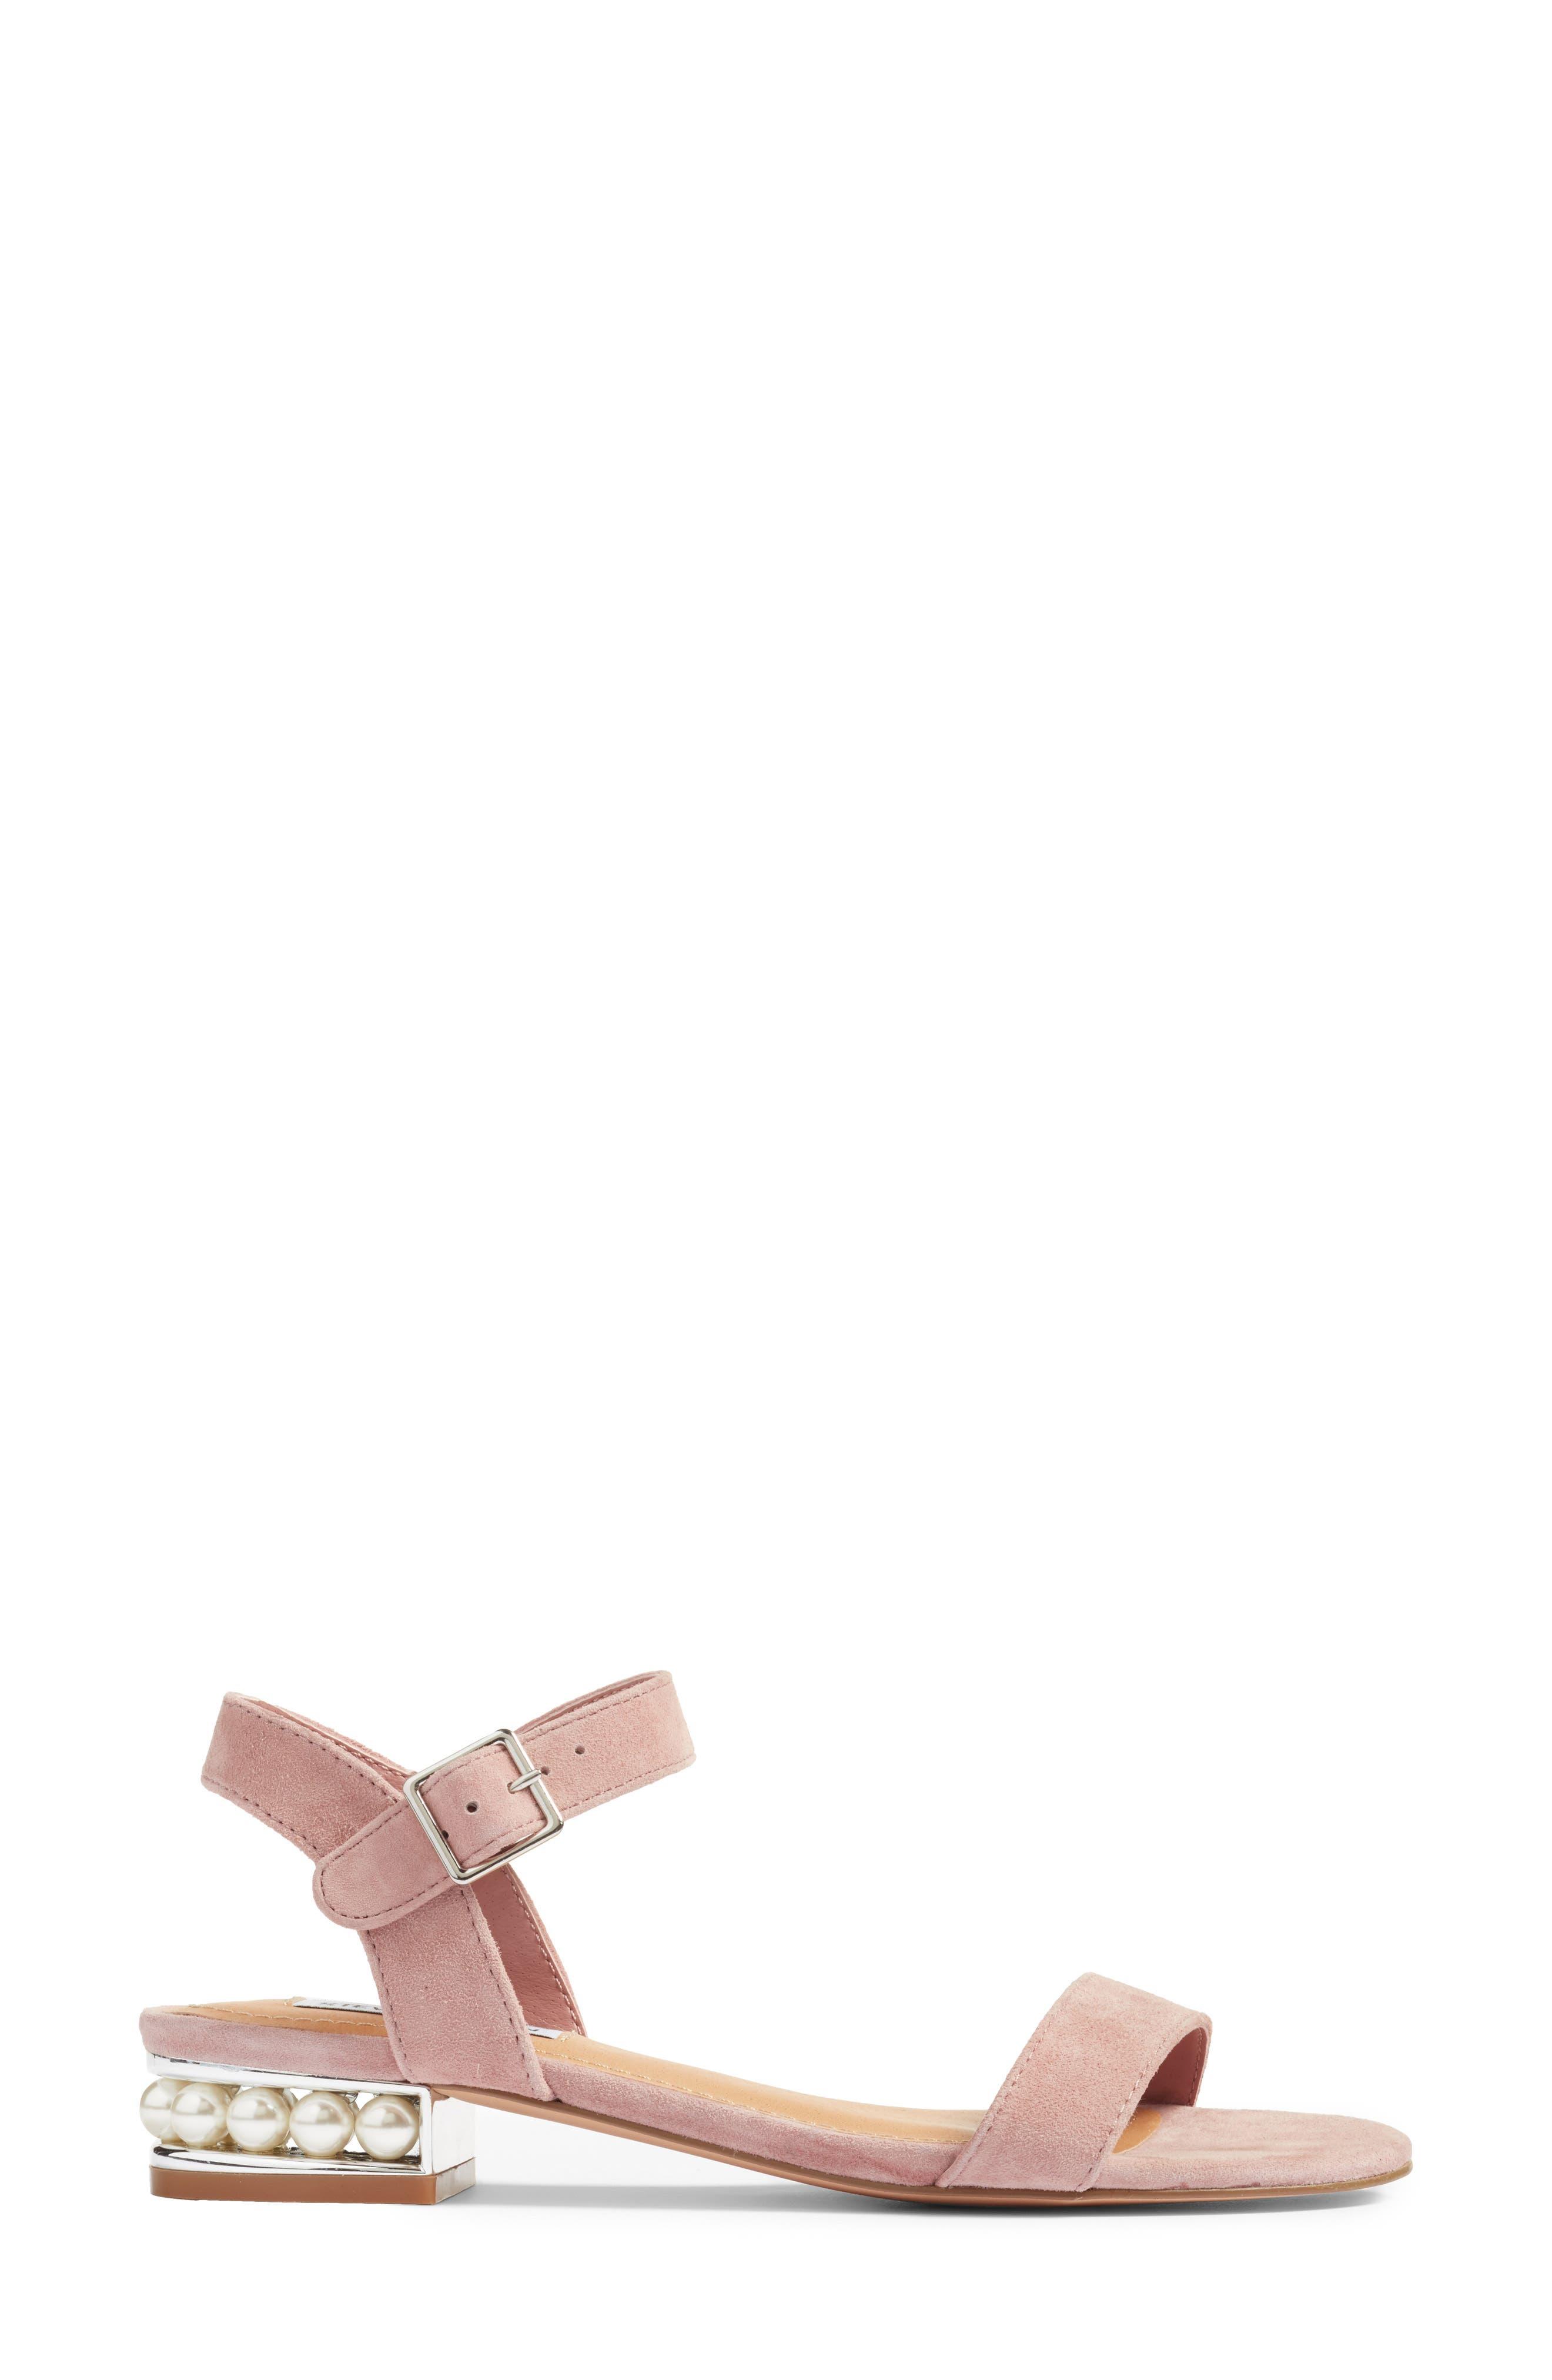 Alternate Image 3  - Steve Madden Embellished Sandal (Women)